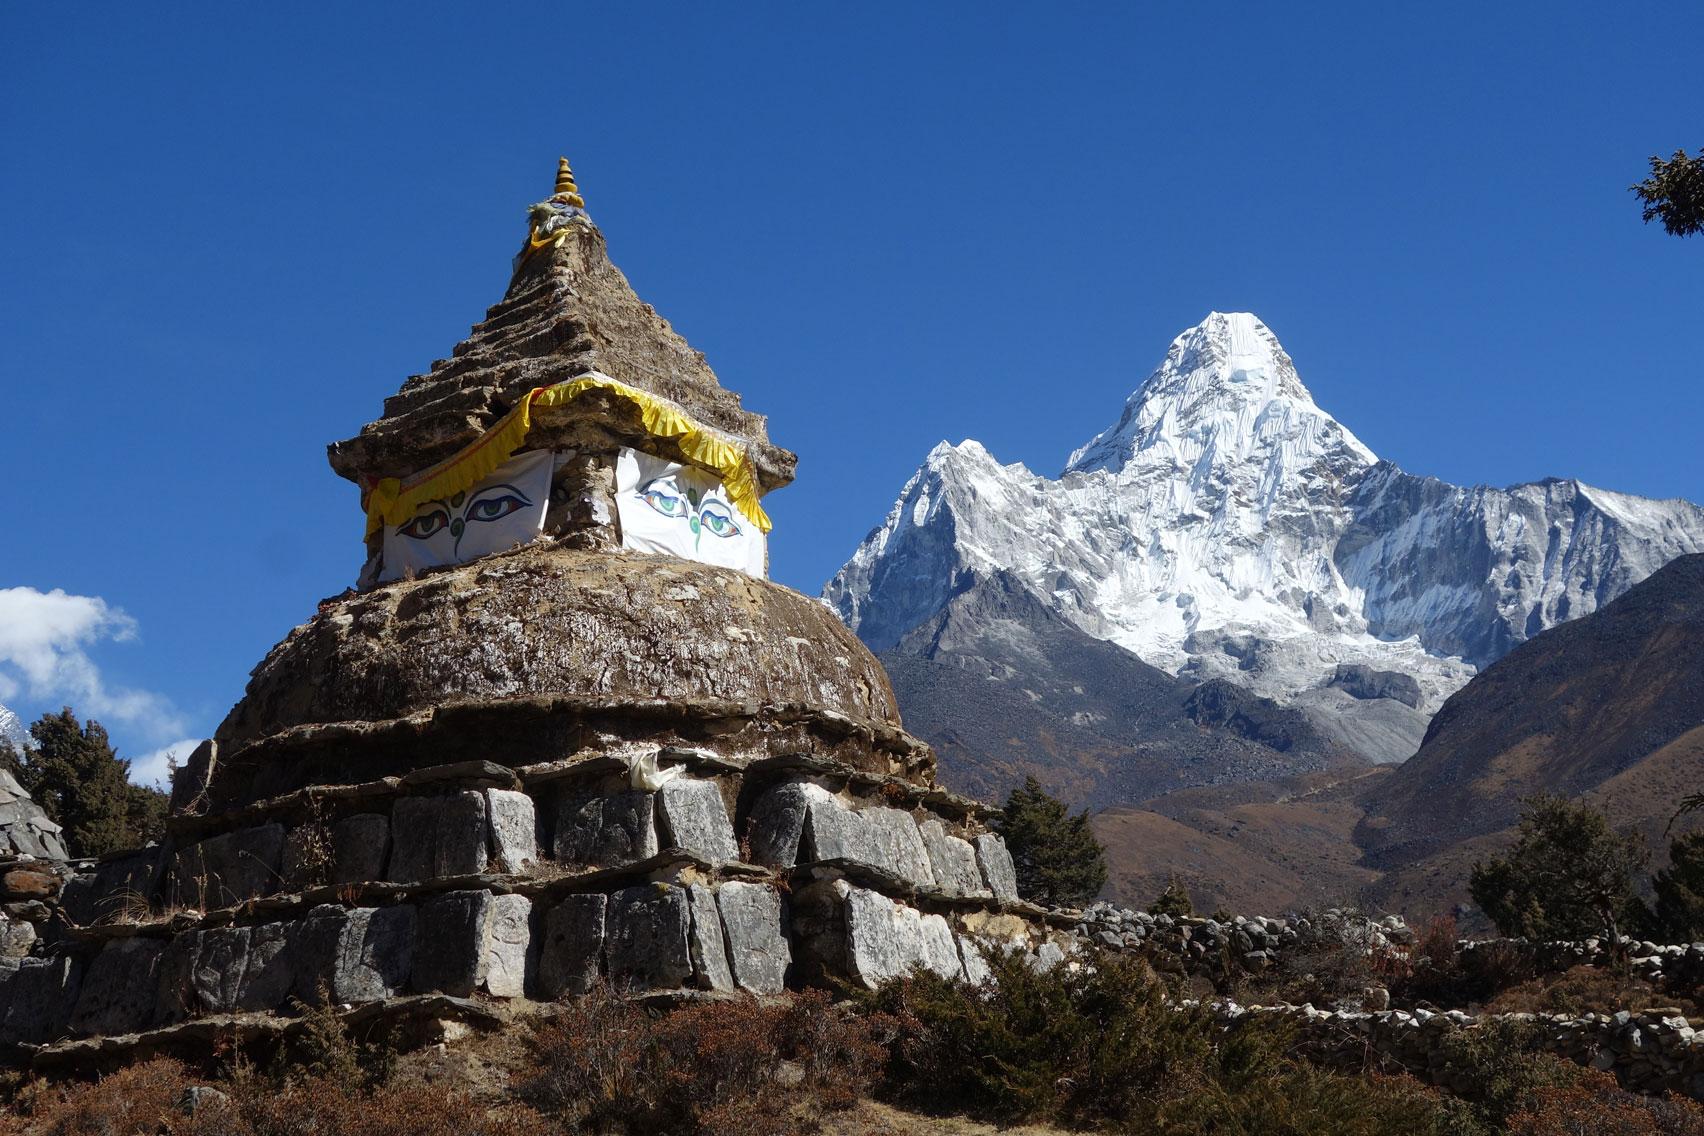 Day 6: Trek from Namche Bazaar (3445m)  to Phortse (5hrs, 3800m)